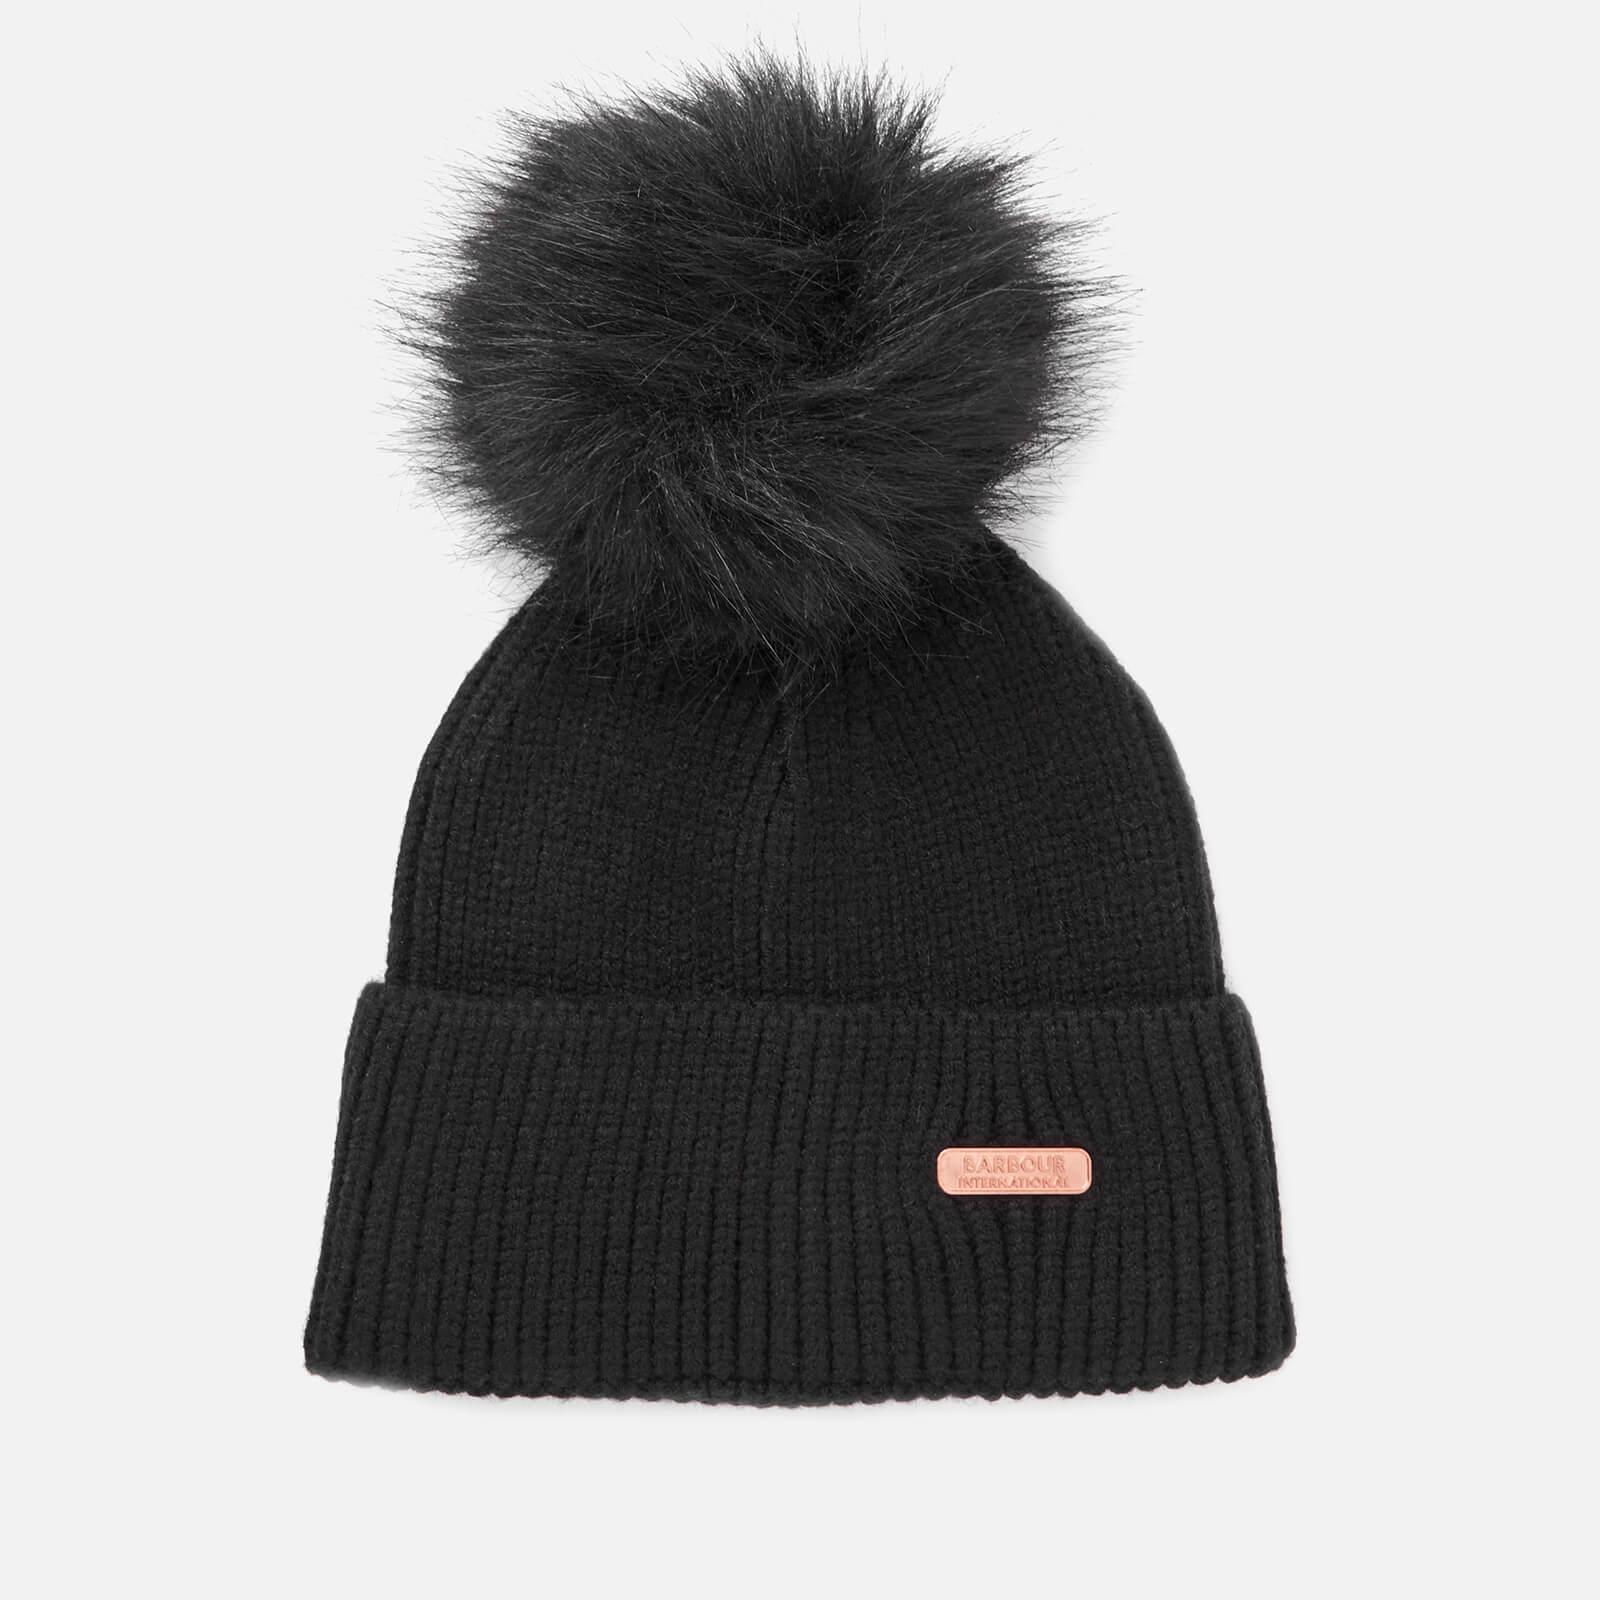 e382266940ae3 Barbour International Women s Mallory Pom Beanie Hat - Black Womens  Accessories